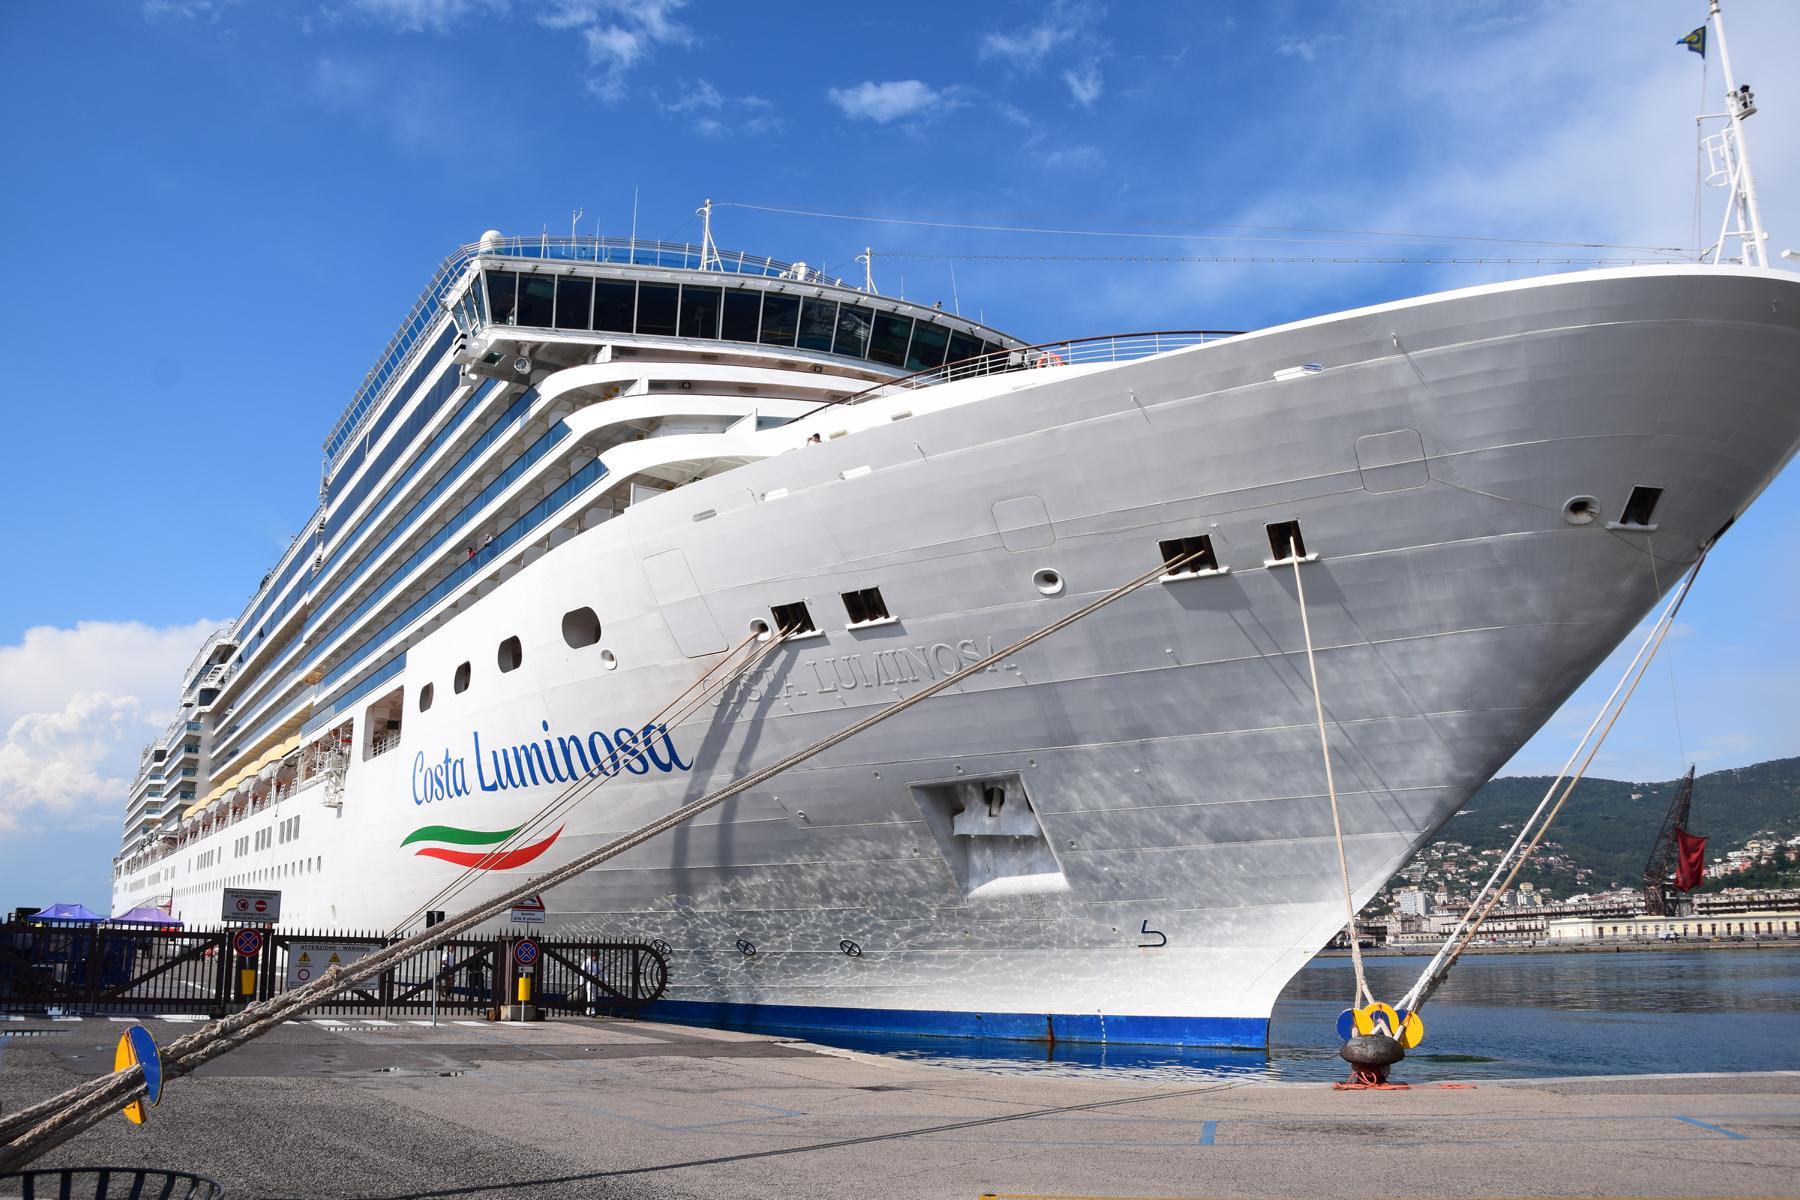 kreuzfahrtschiff costa luminosa kreuzfahrt mittelmeer hafen triest italien